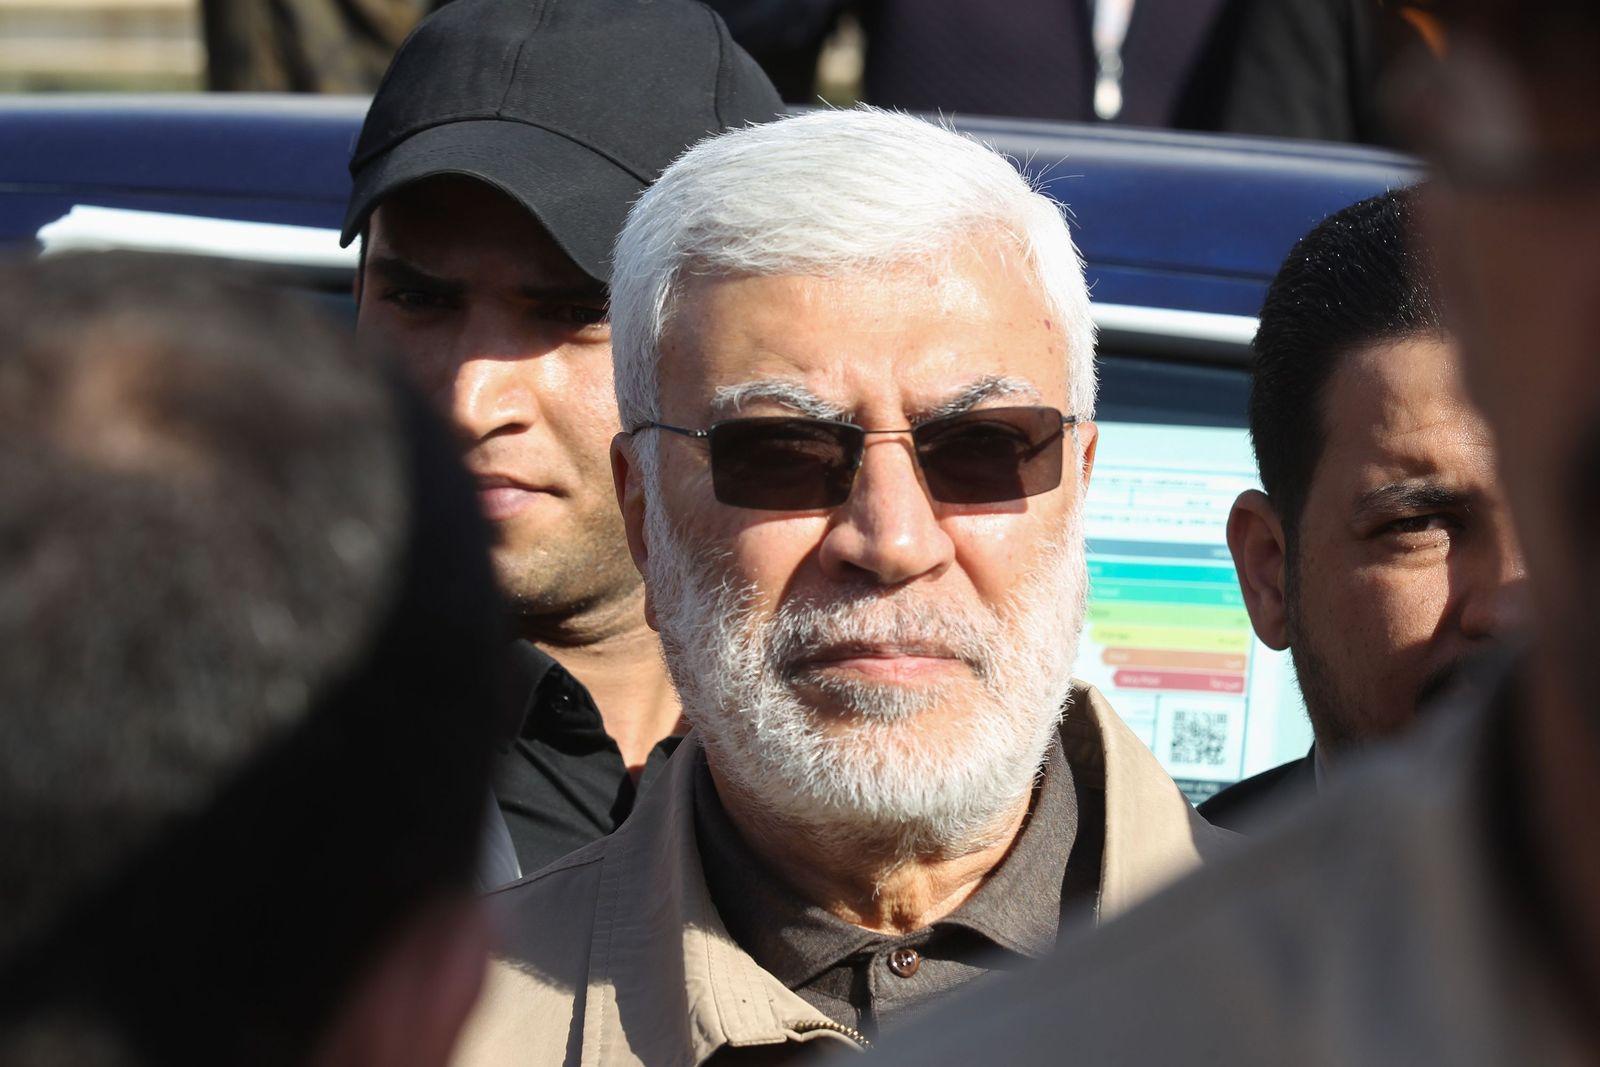 Abu Mahdi al-Muhandis